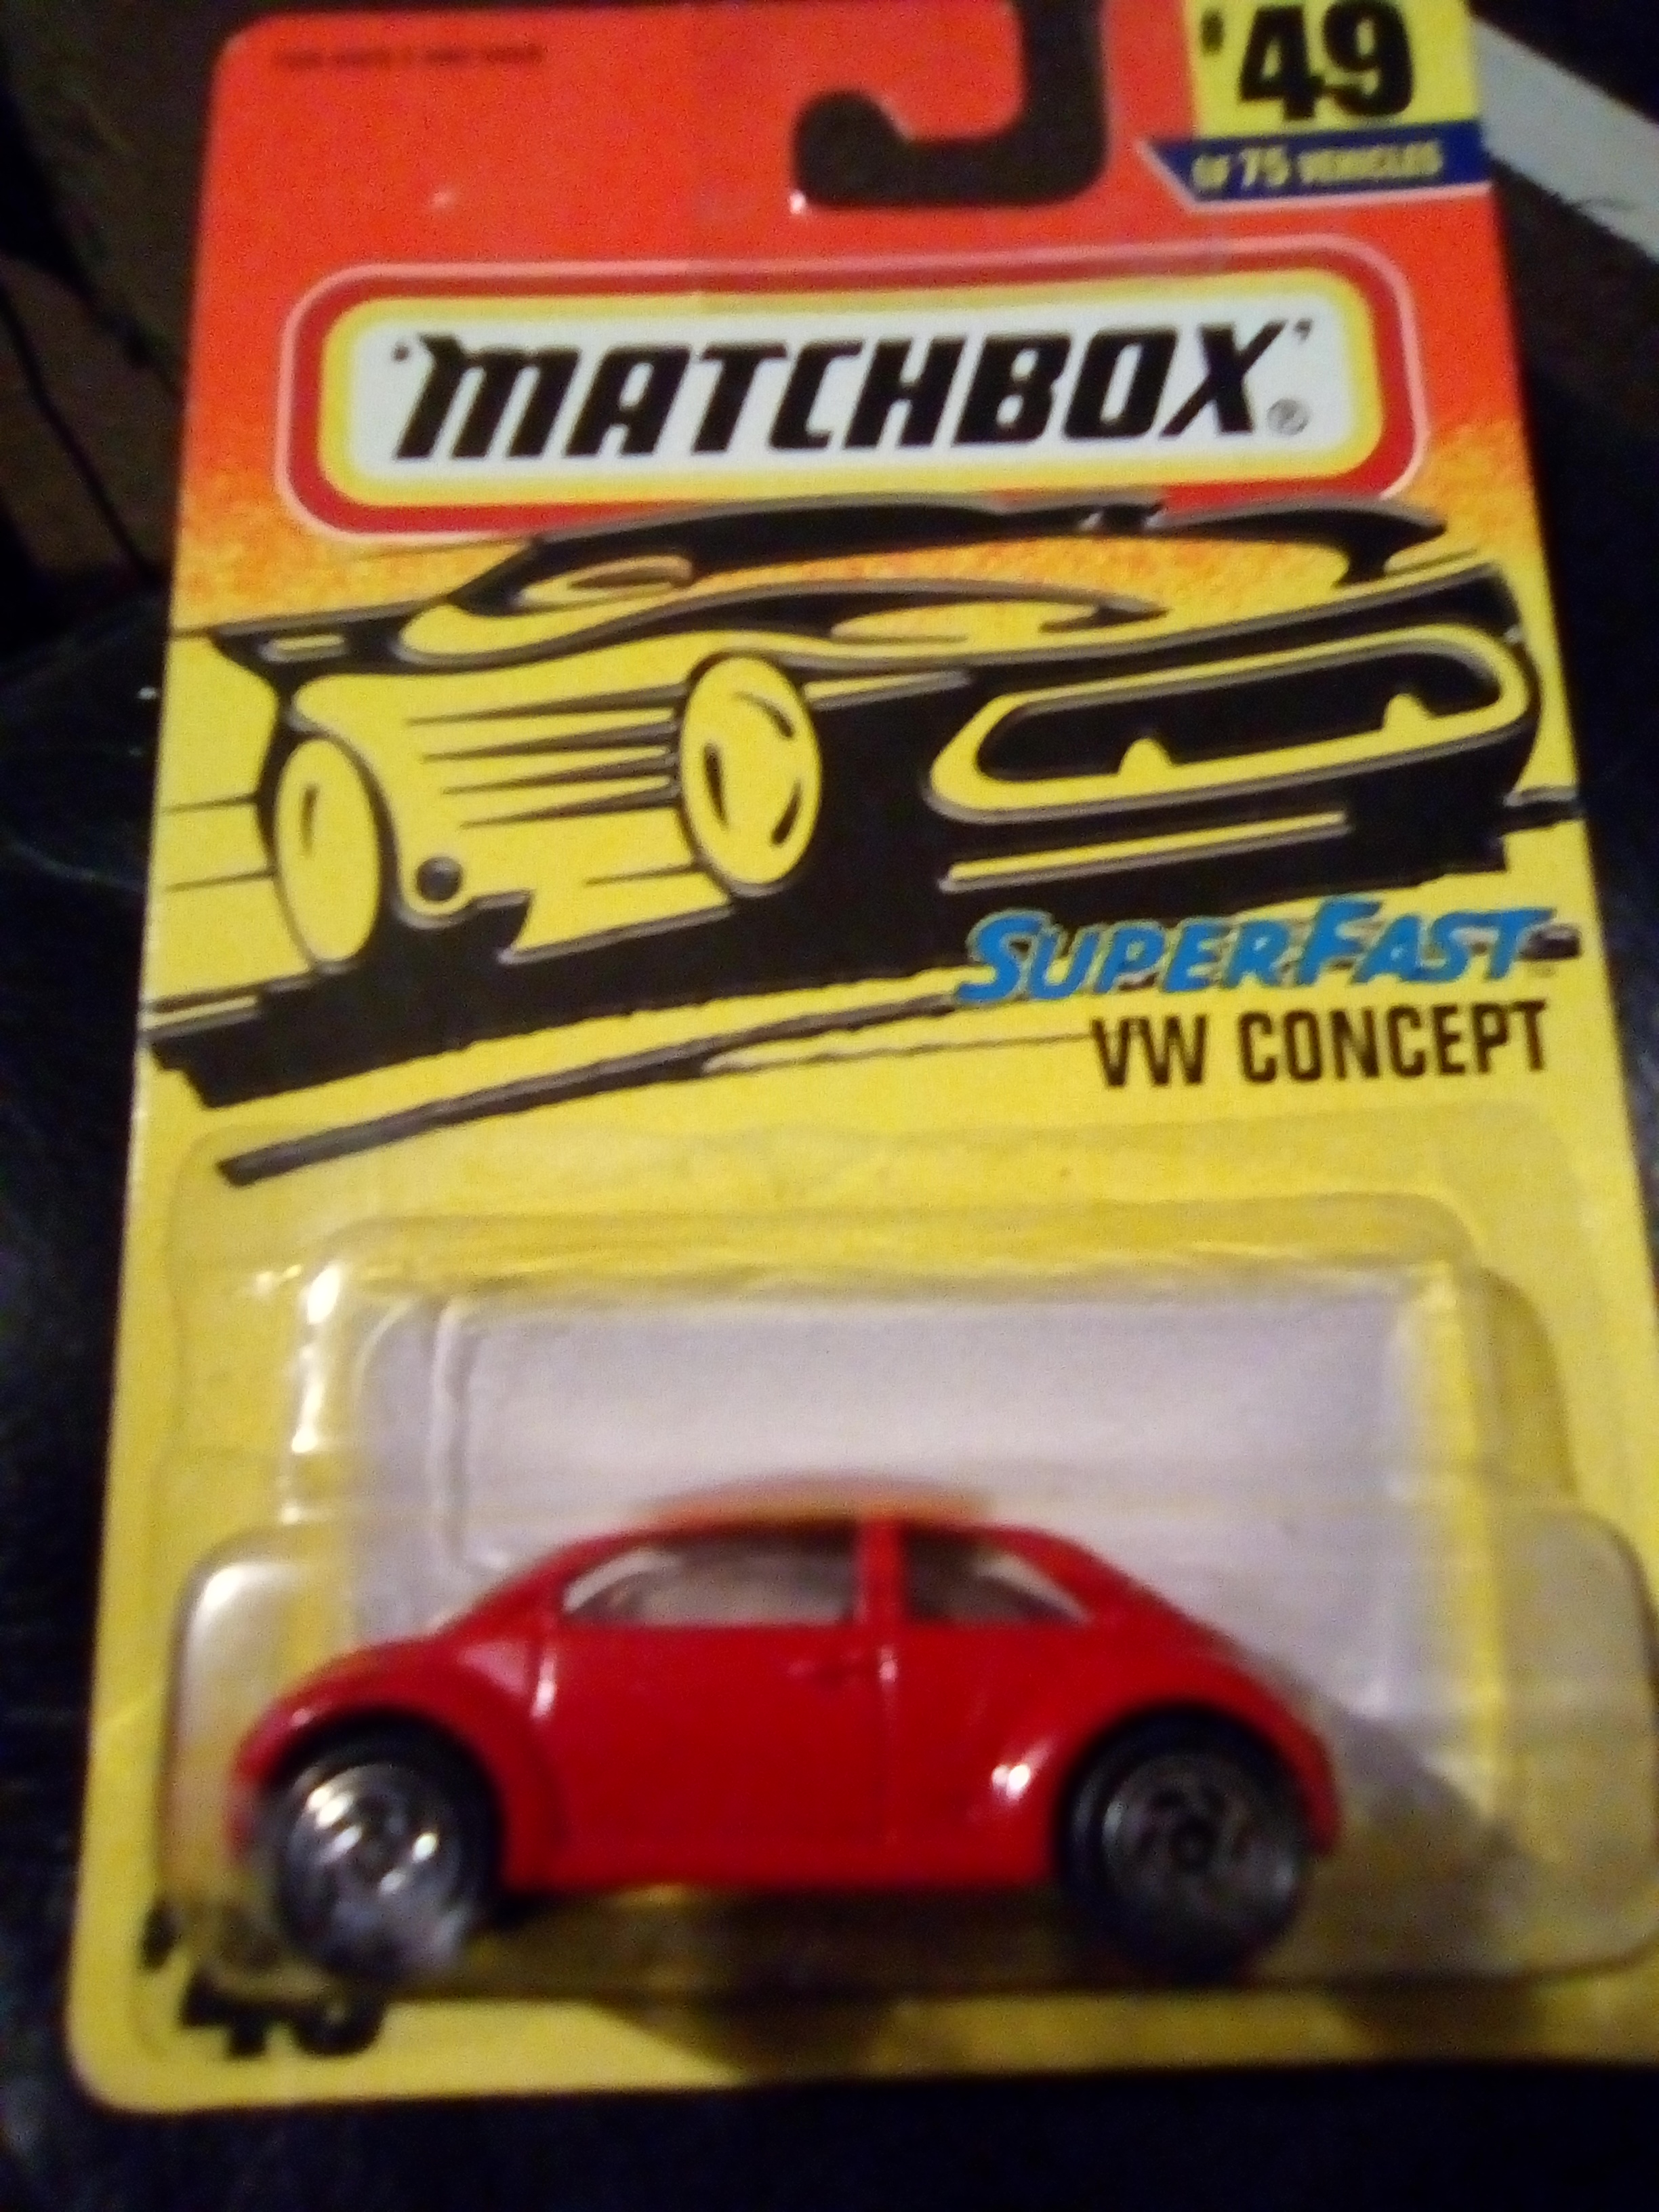 VW Concept (MB49).jpg